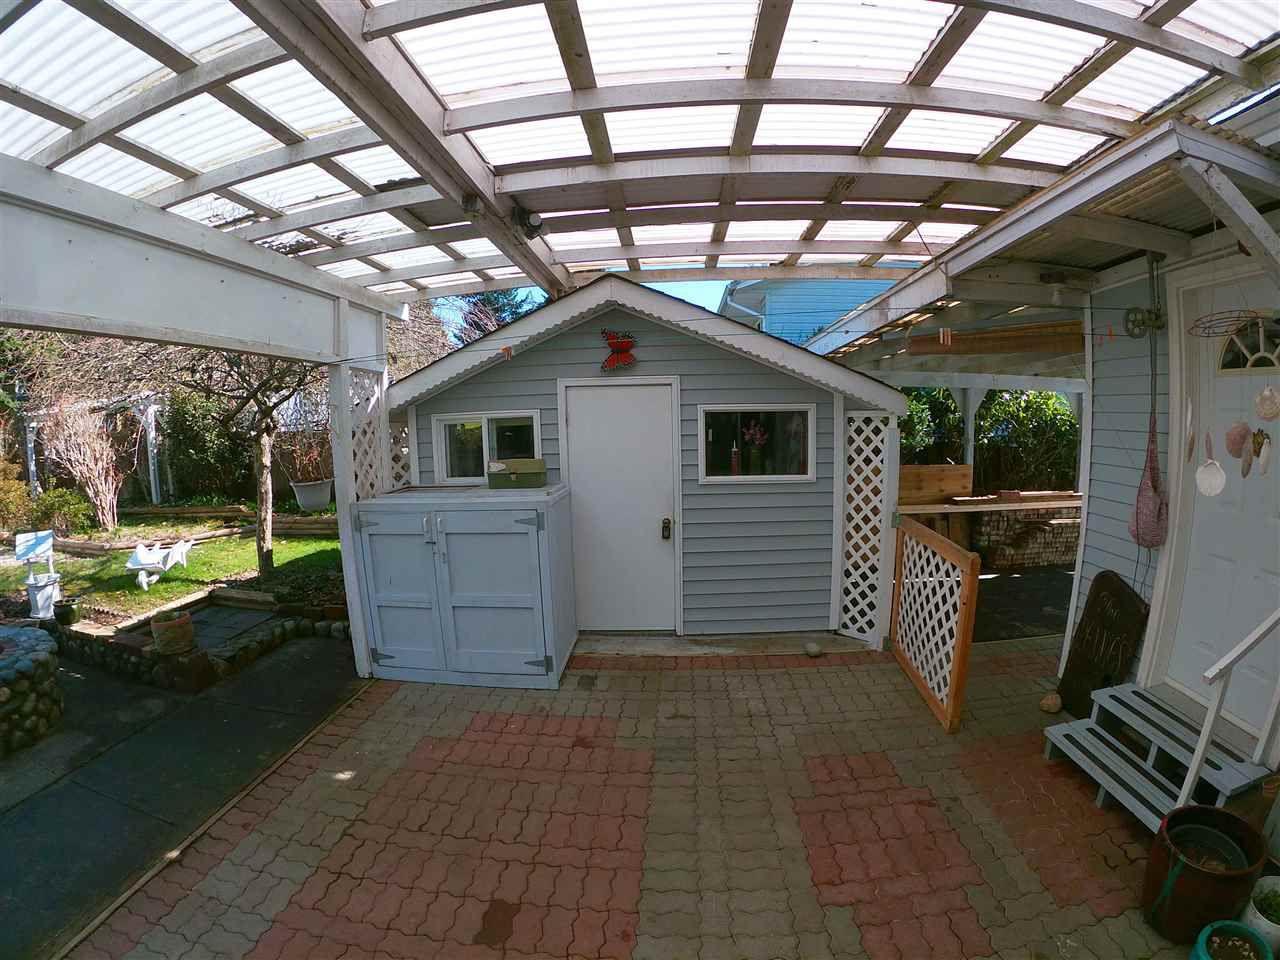 Photo 19: Photos: 5702 MEDUSA Street in Sechelt: Sechelt District House for sale (Sunshine Coast)  : MLS®# R2323721